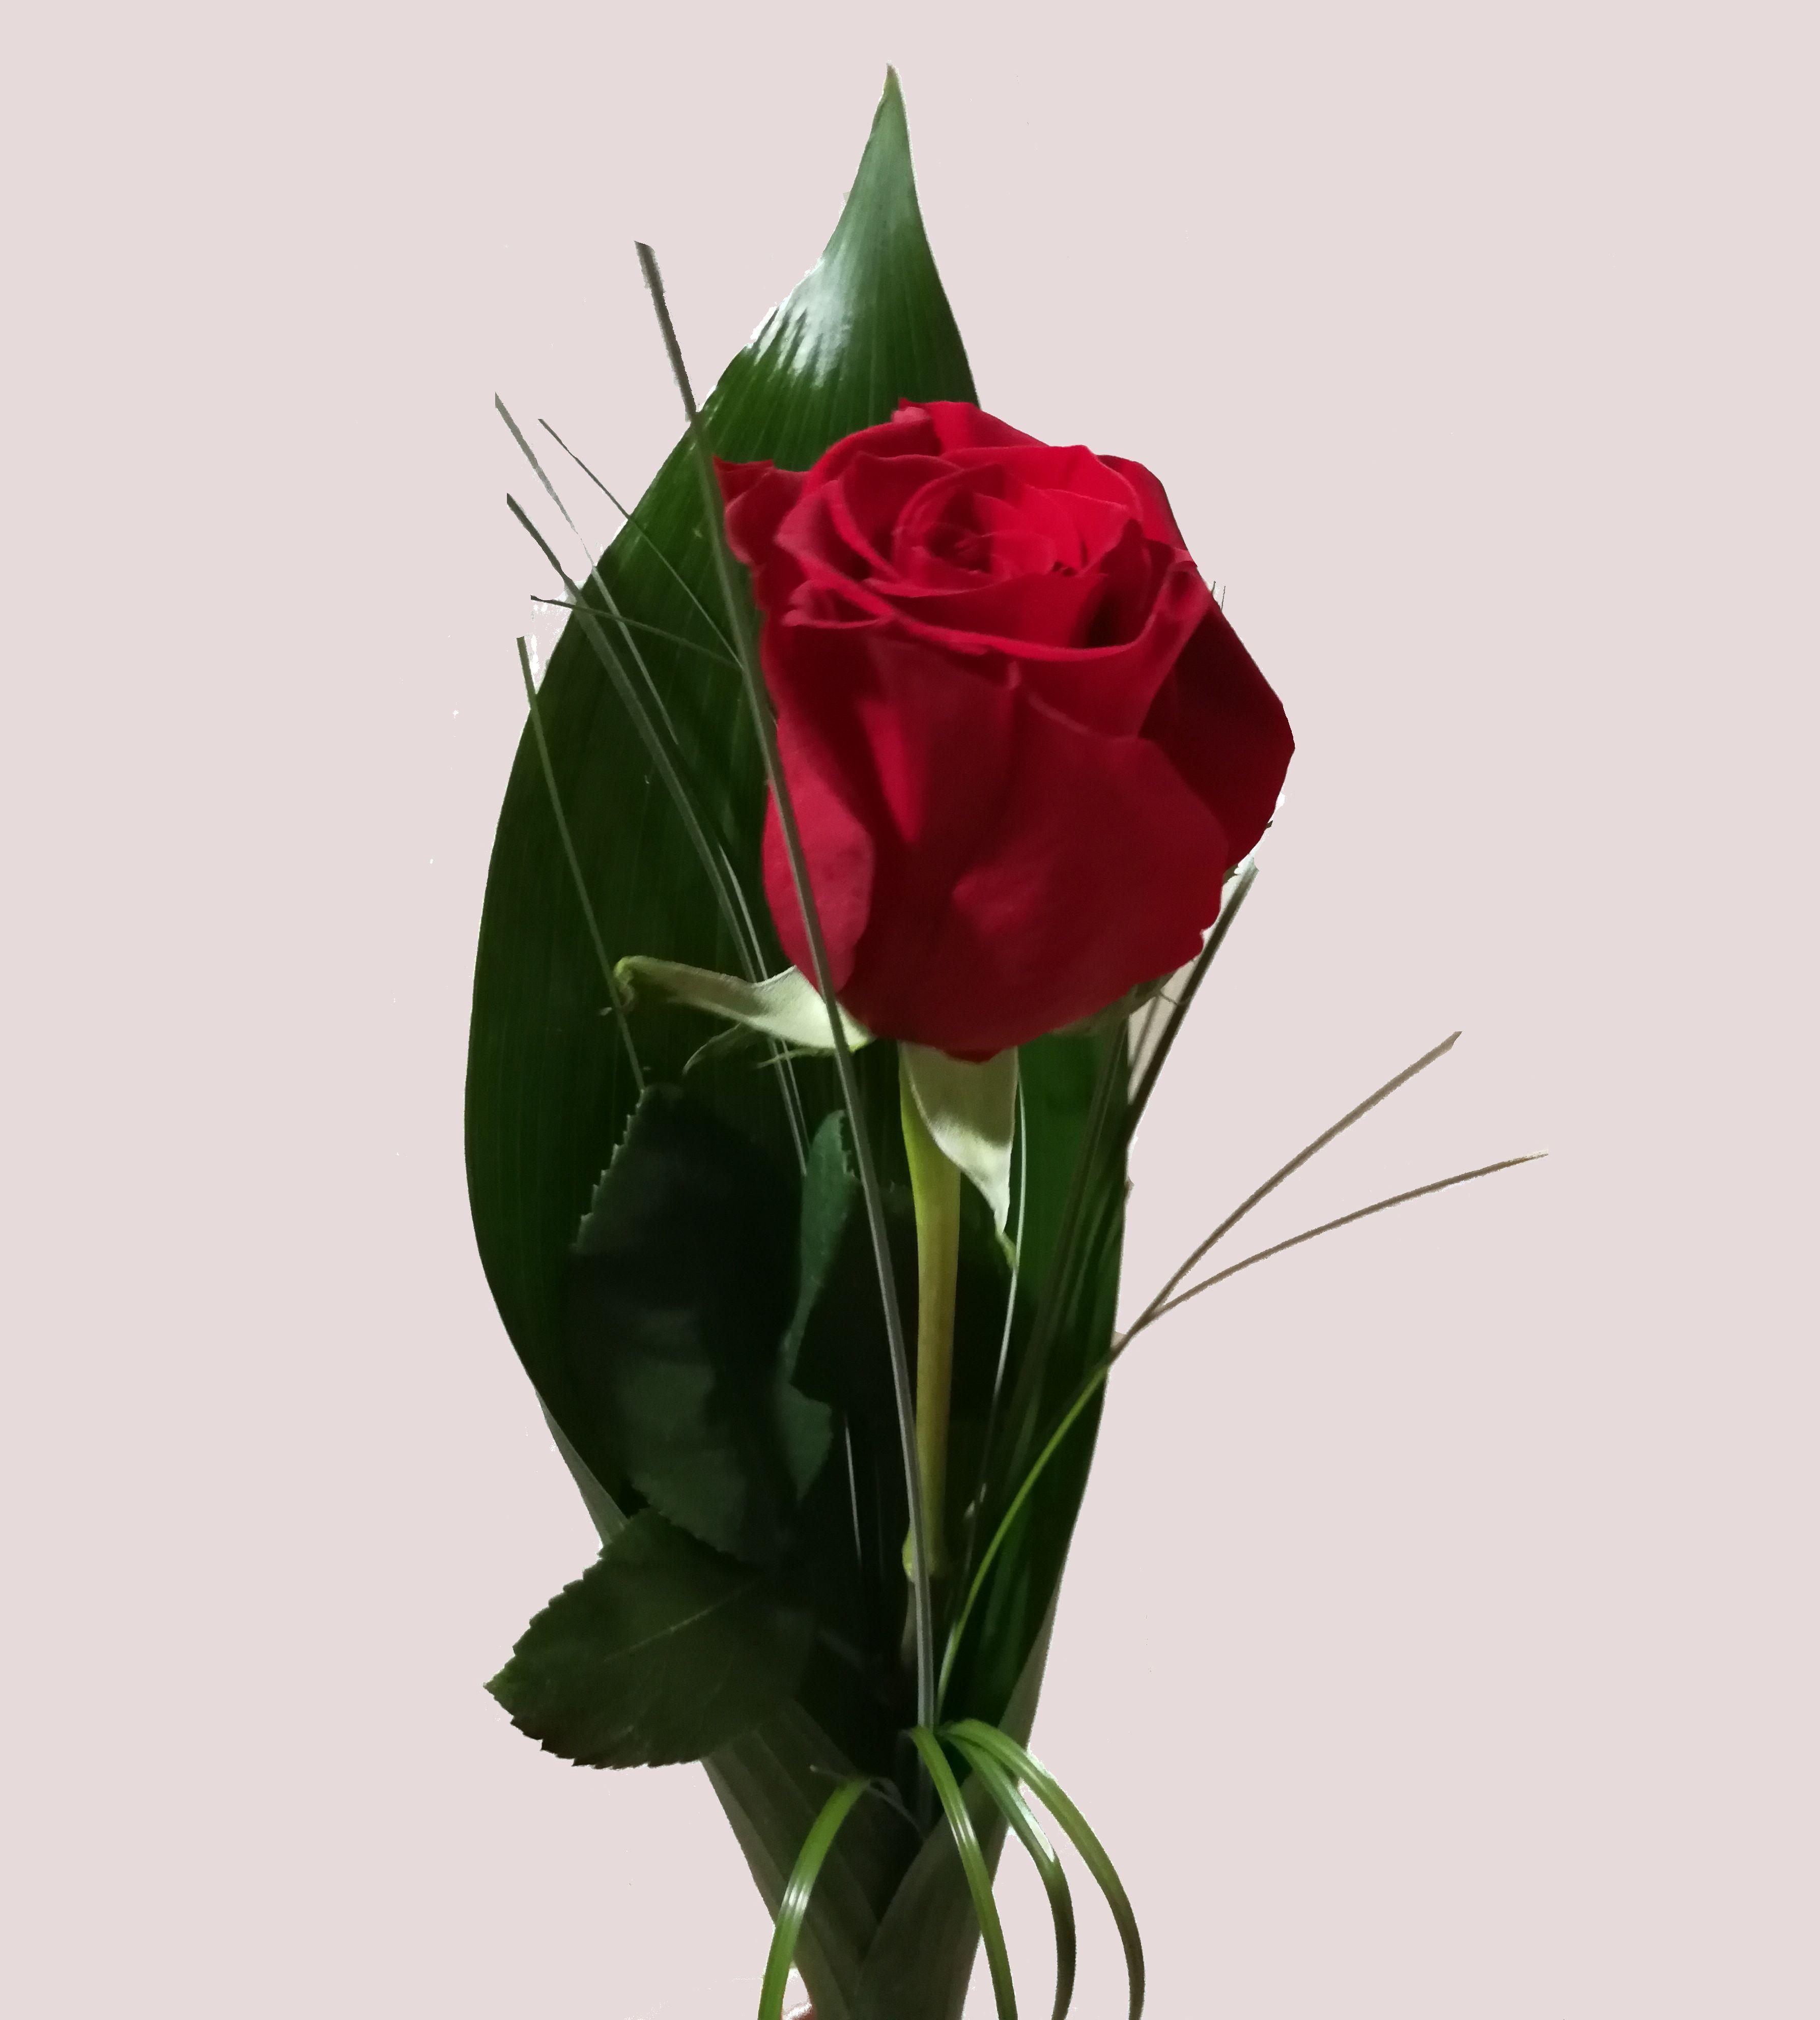 Rosa Roja Flores Dalia